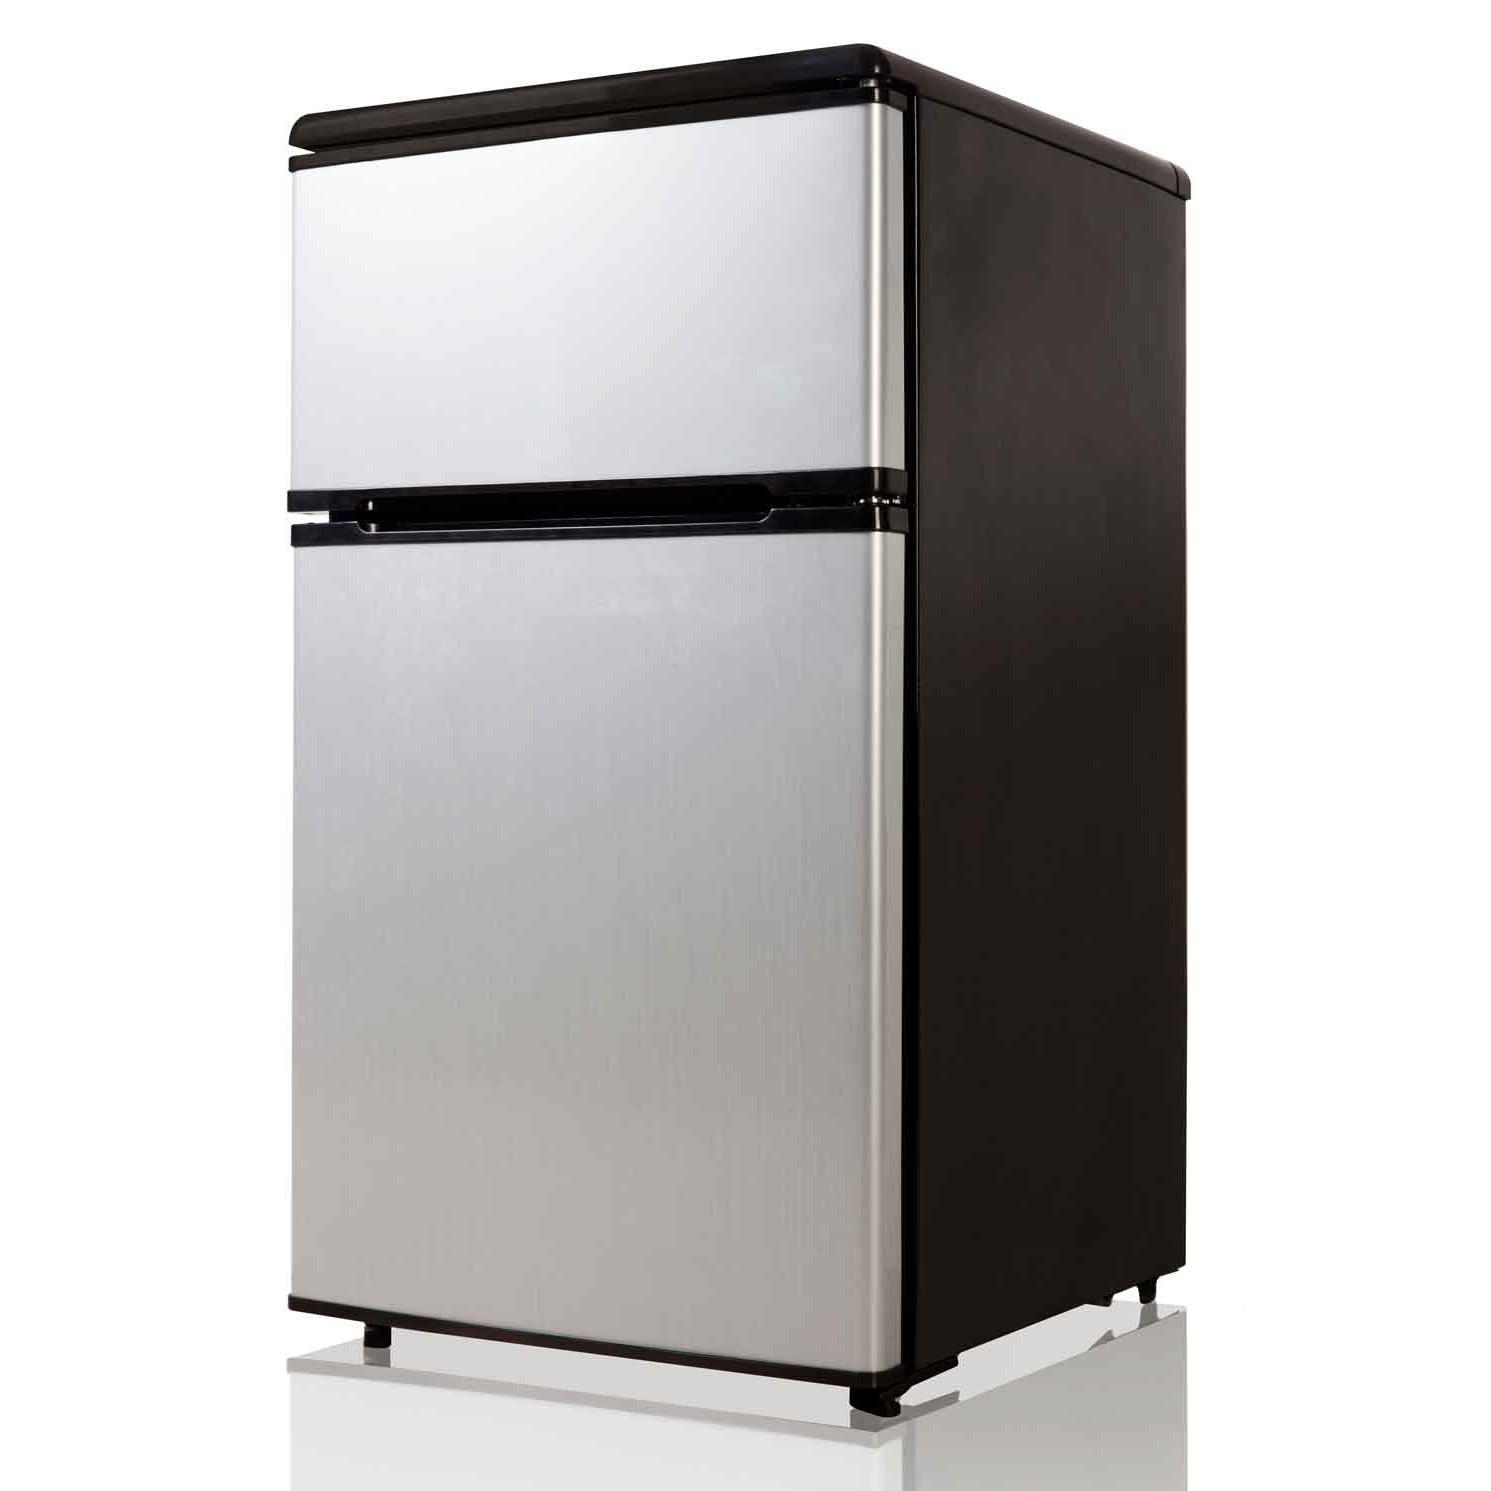 Avanti Beverage Refrigerator | Pc Richard Refrigerator | Avanti Refrigerator